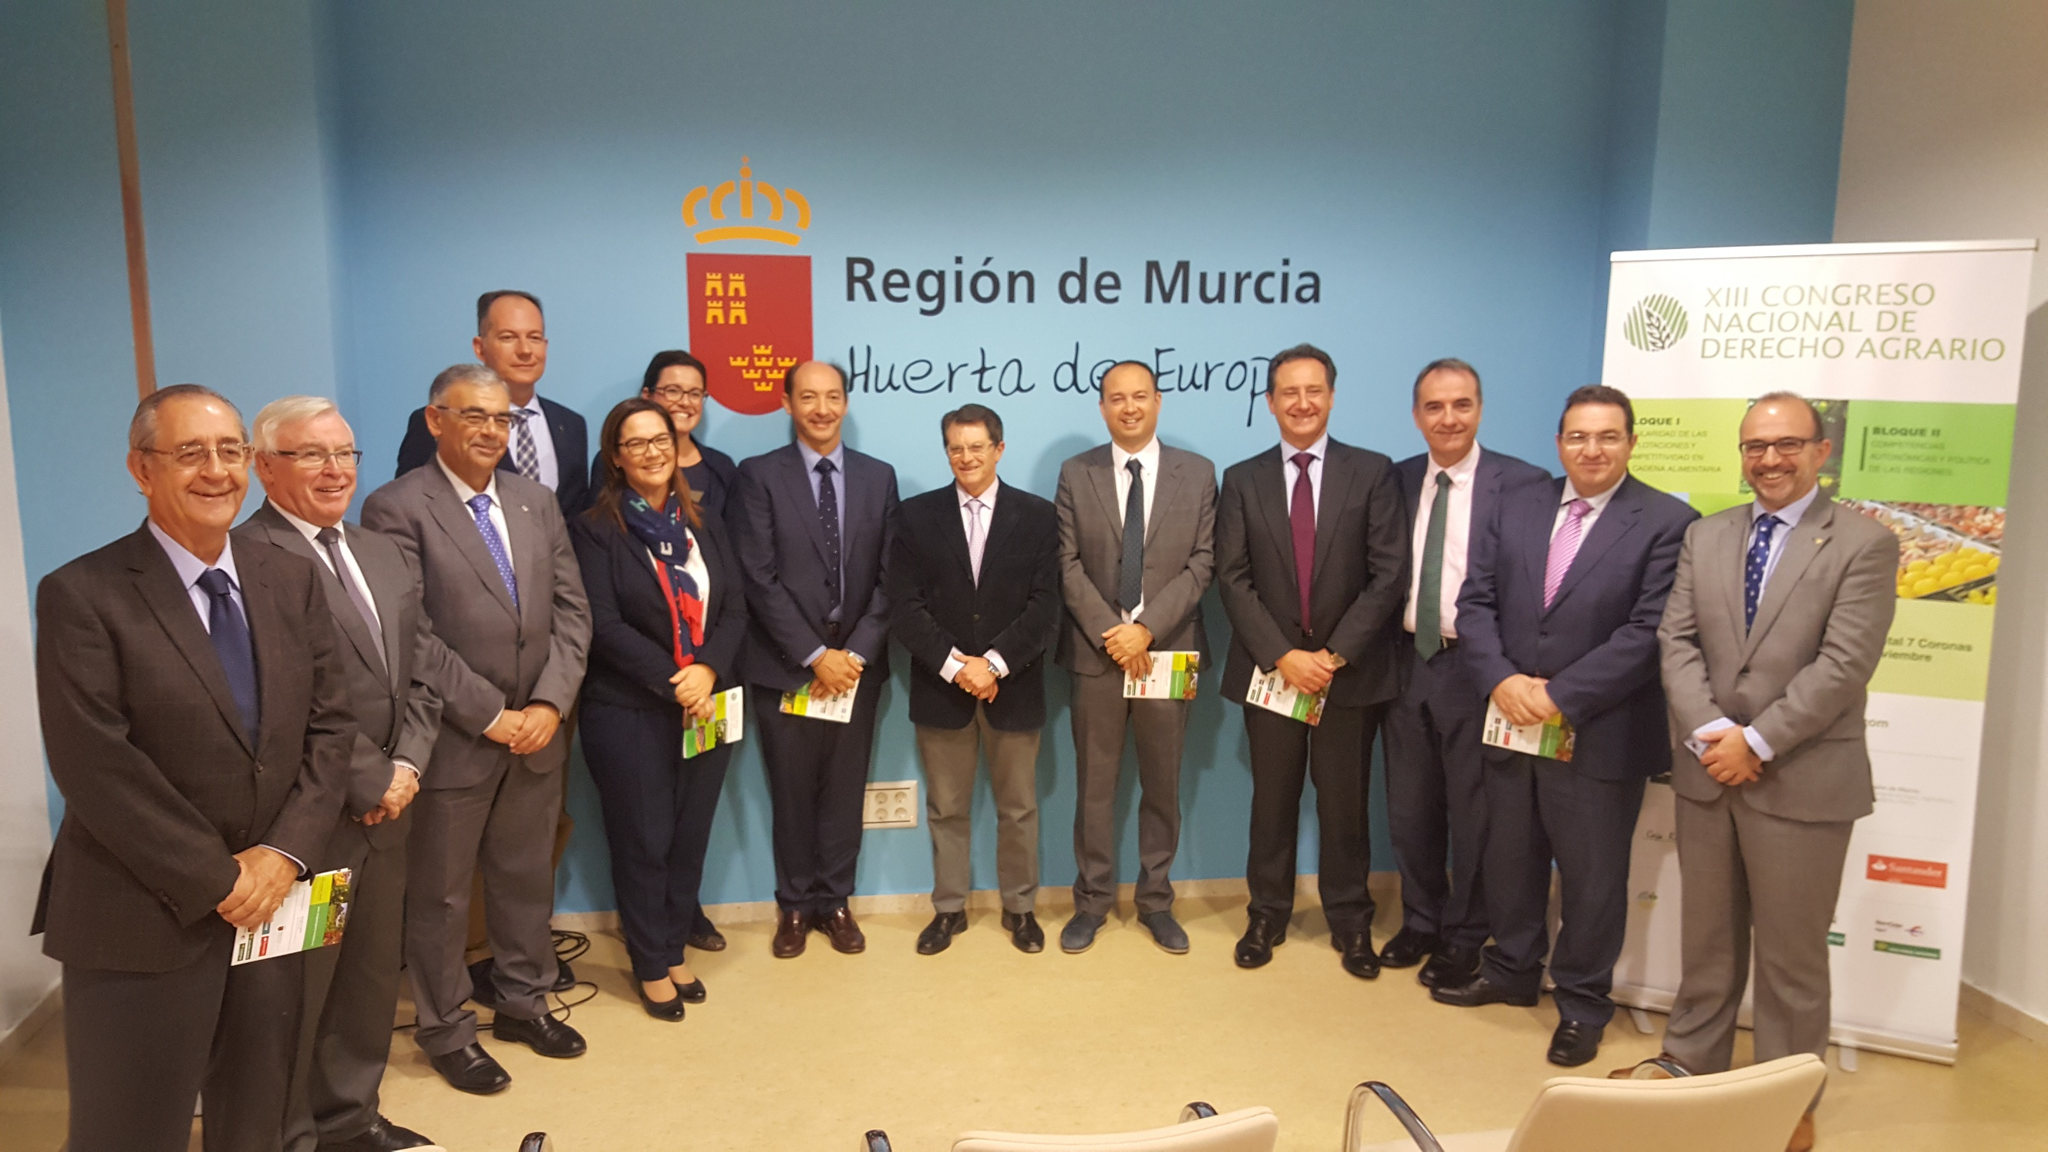 https://blog.globalcaja.es/wp-content/uploads/2017/11/Congreso-Nacional-de-Derecho-Agrario.jpg